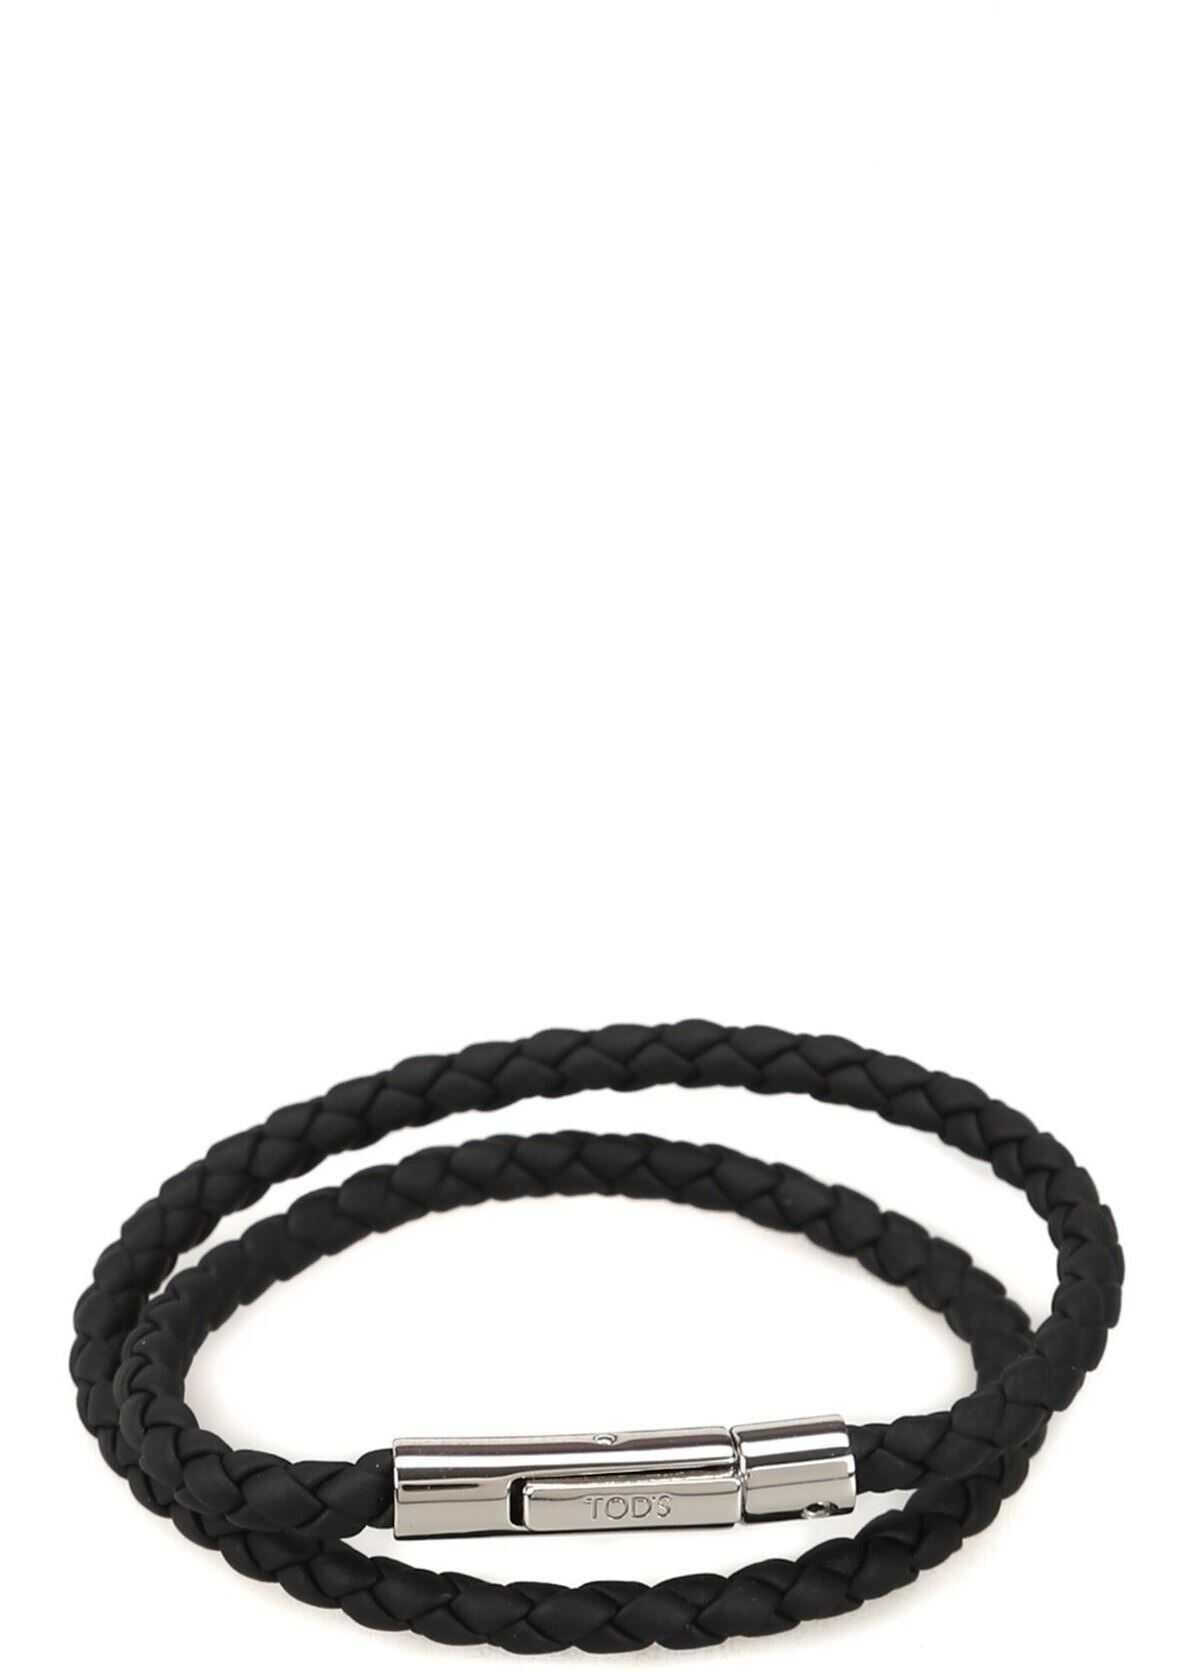 TOD'S Mycolors Black Leather Bracelet Black